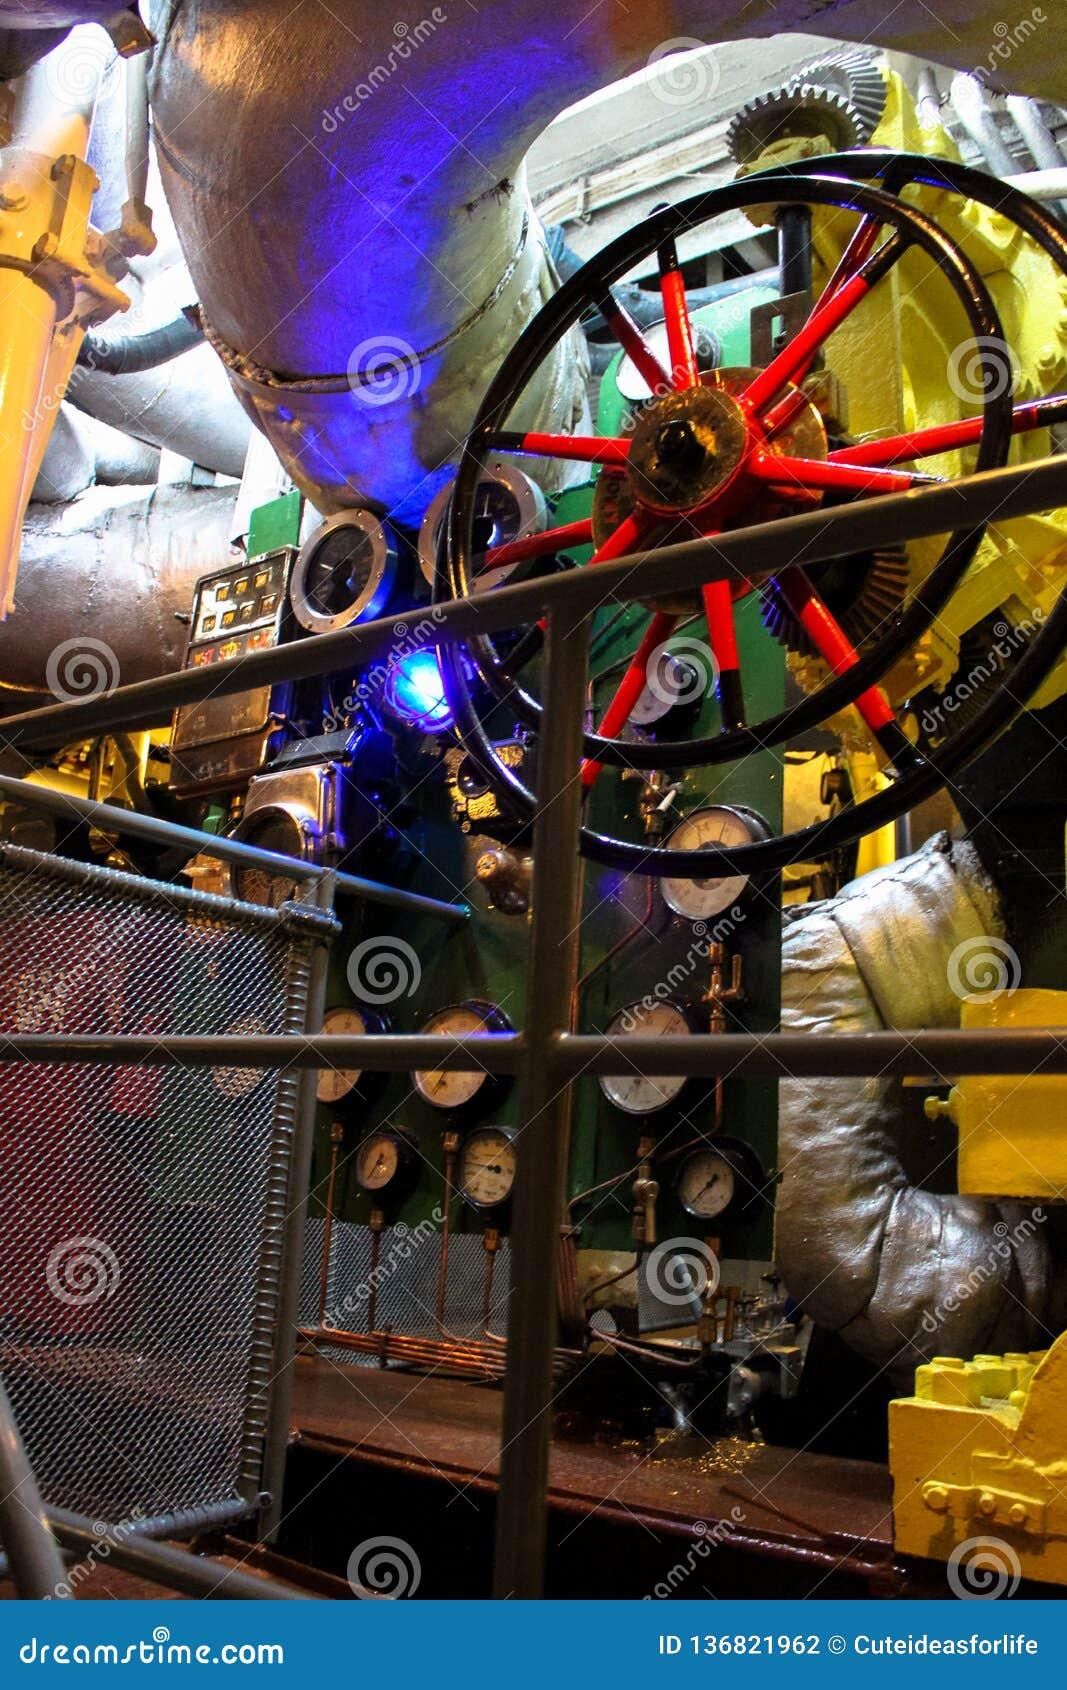 Battleship Engine Room: The Engine Room Of The Polish Warship